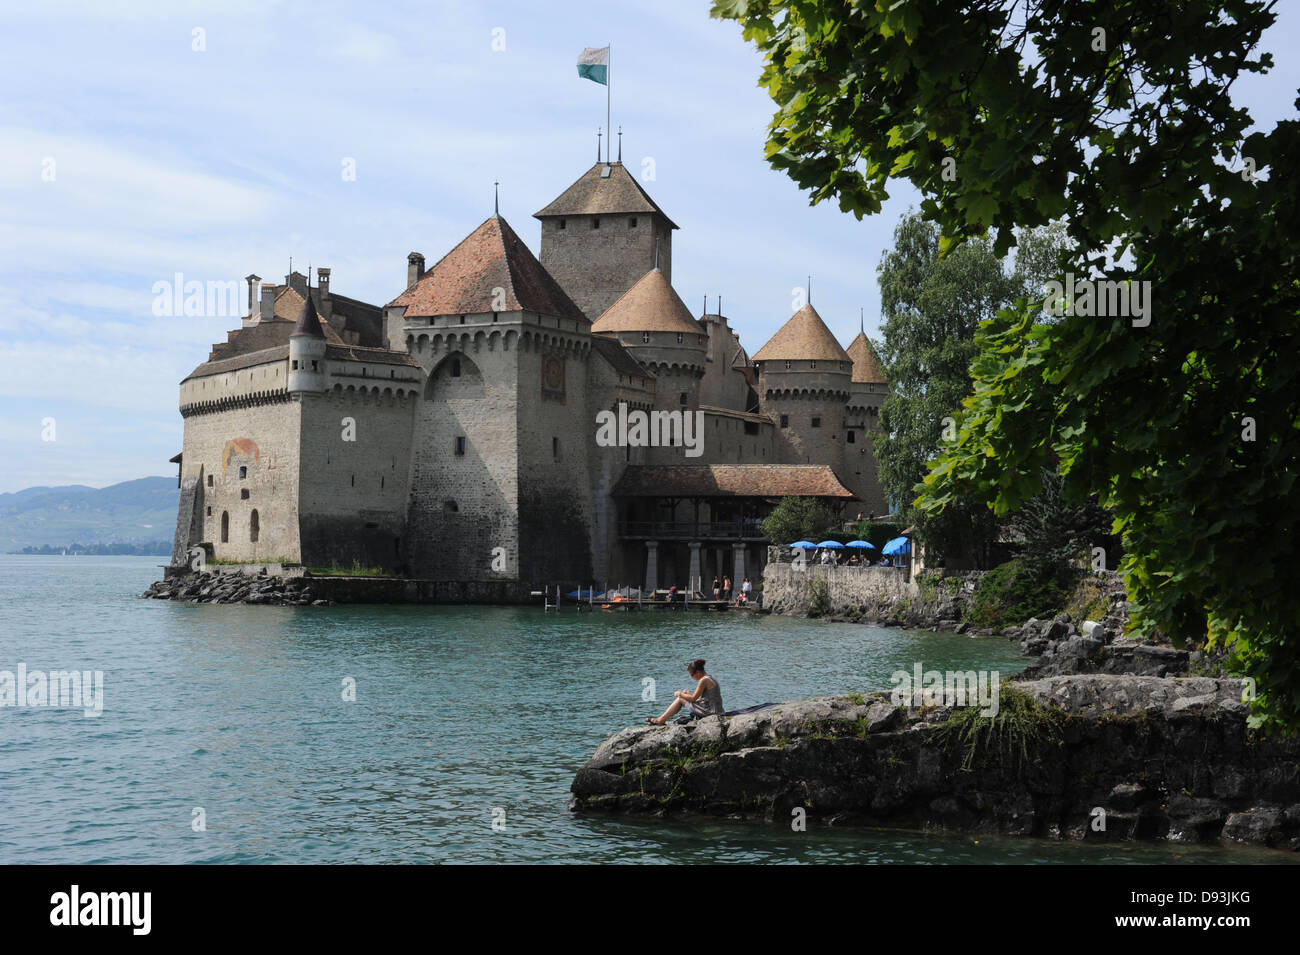 Castle Chillon at Montreux on lake Leman, Switzerland - Stock Image